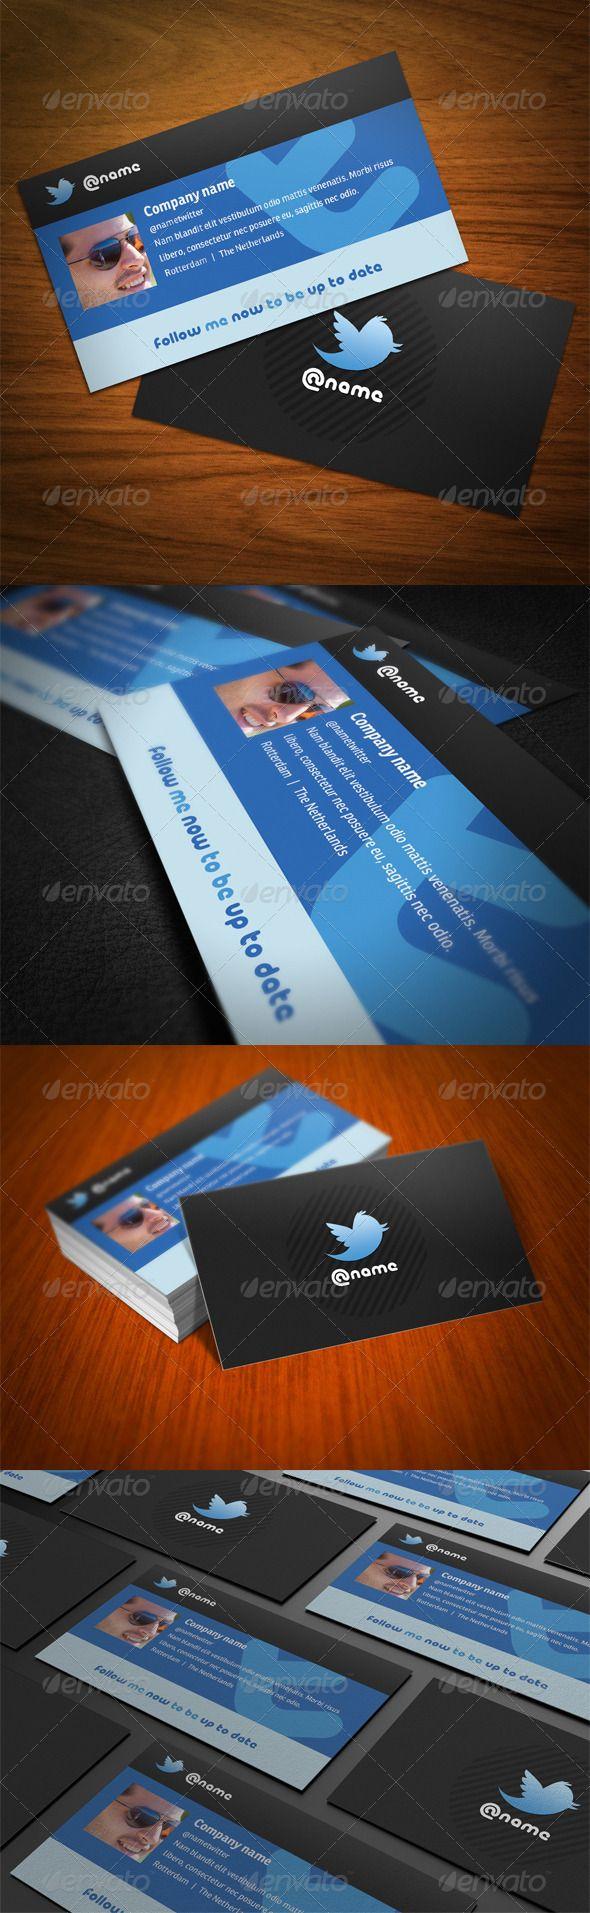 Instagram Facebook Twitter Business Card Zazzle Com Business Card Template Design Business Card Design Business Card Template